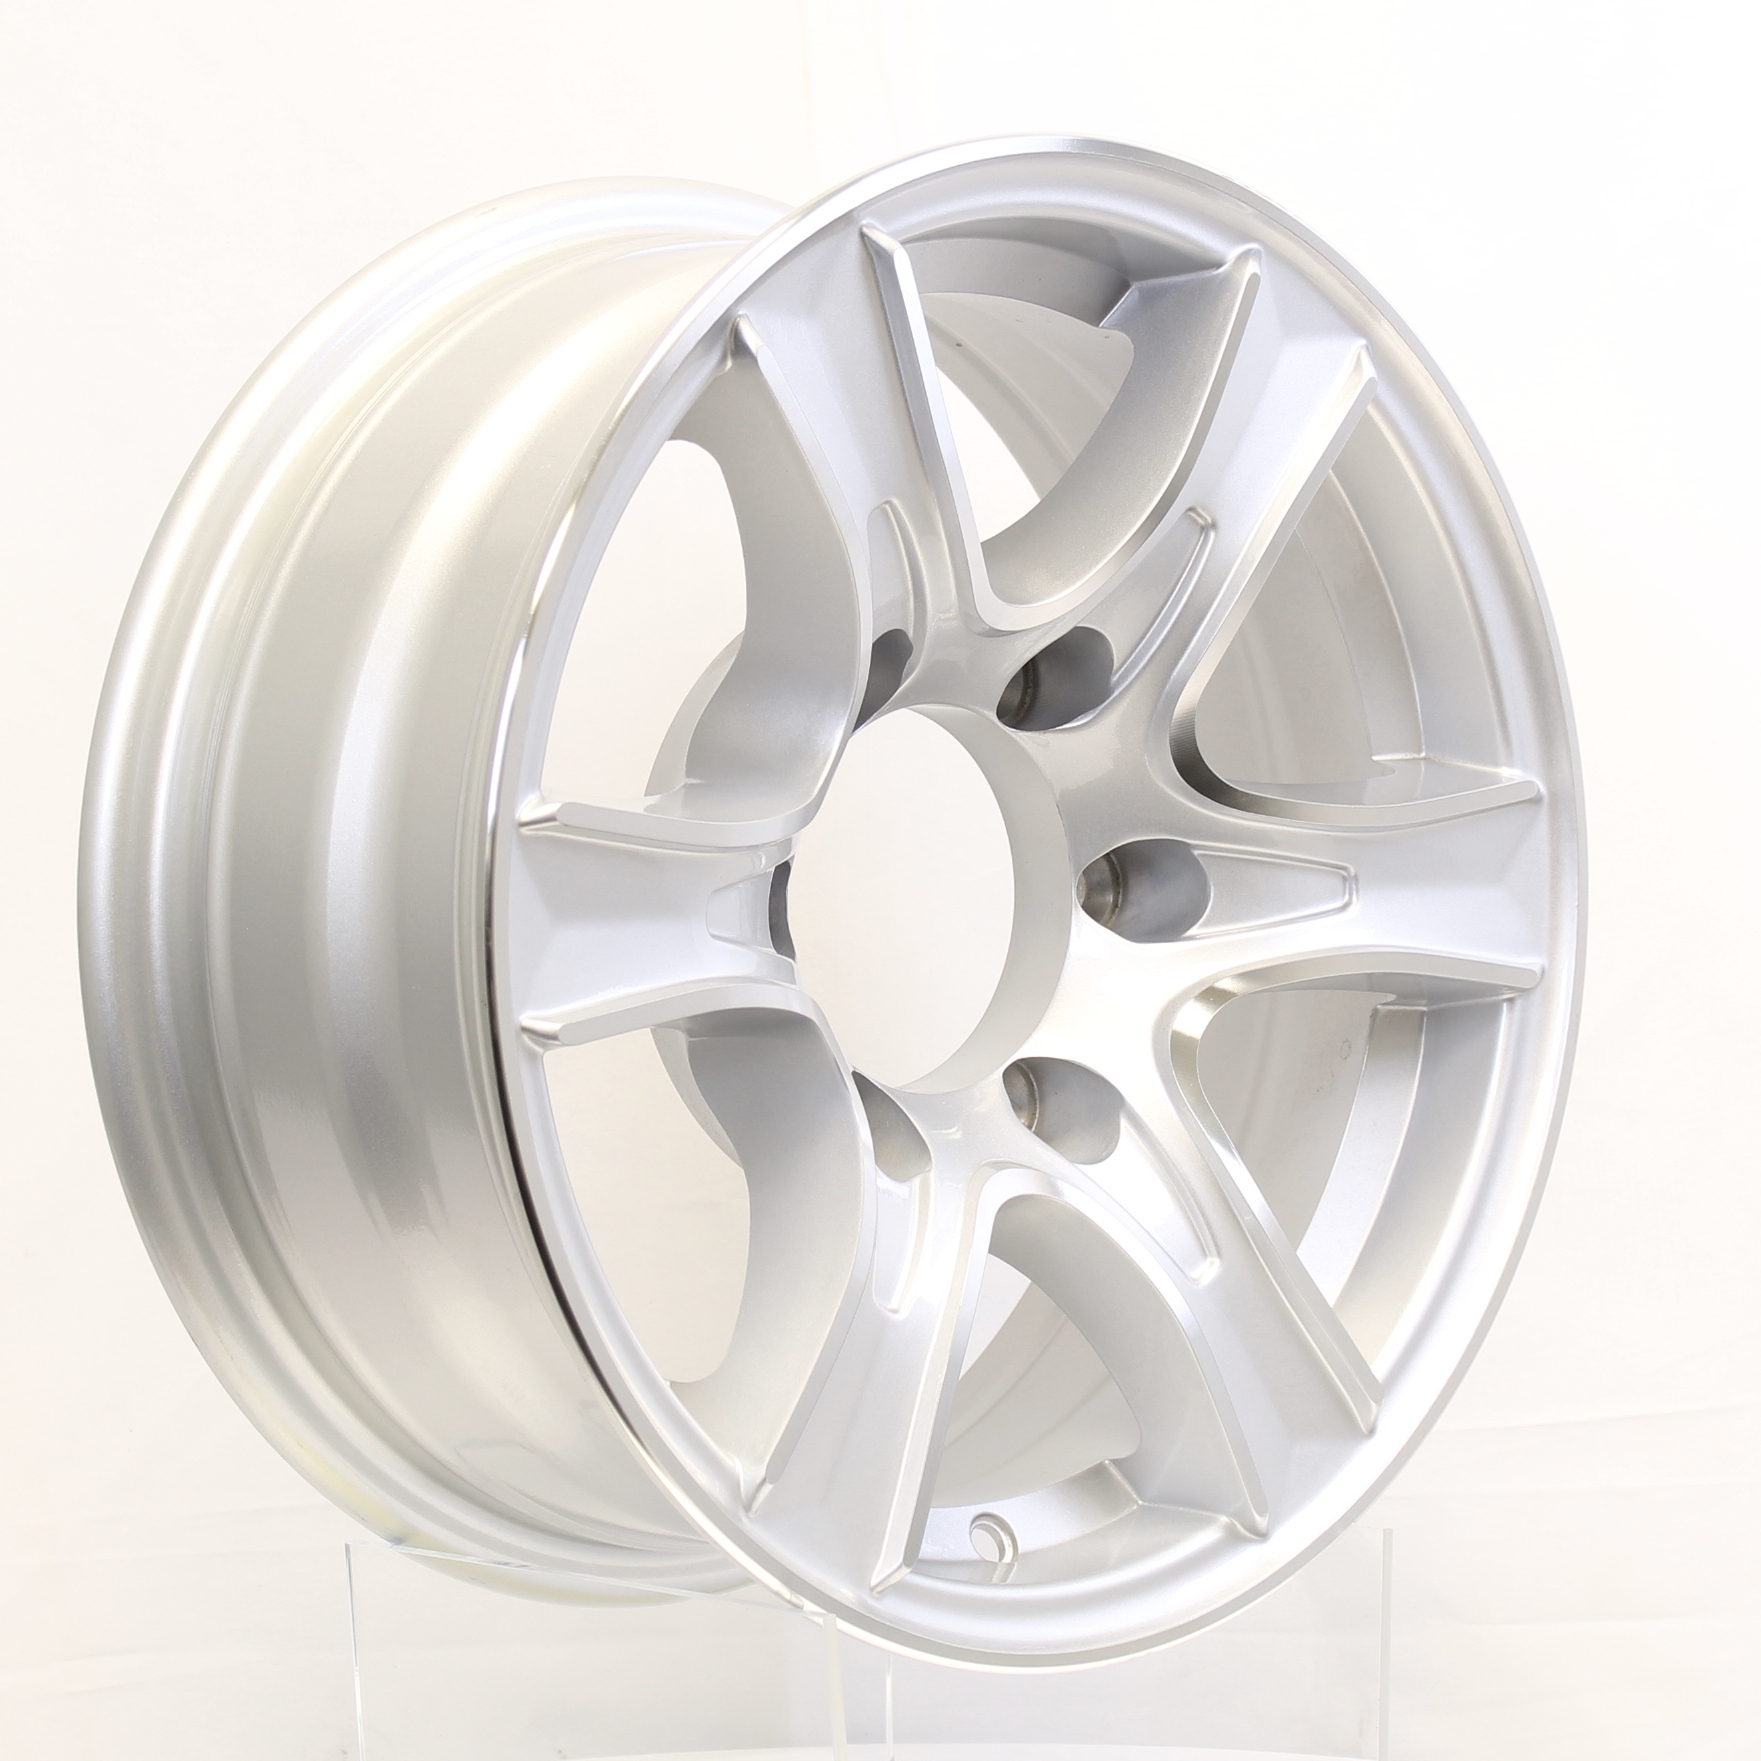 Thoroughbred- 15x6 6-Lug Silver Aluminum Trailer Wheel Image